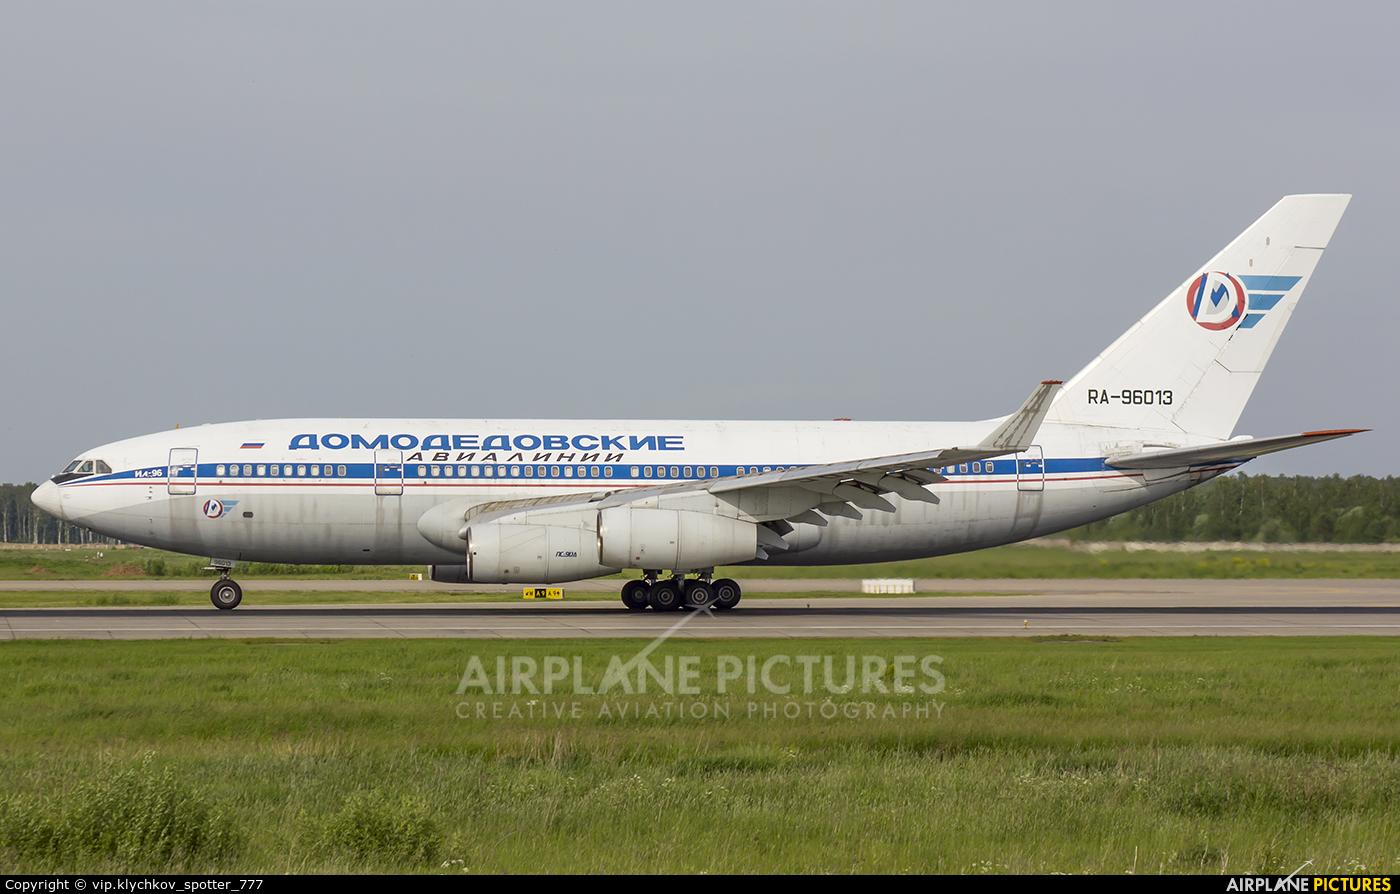 Domodedovo Airlines RA-96013 aircraft at Moscow - Domodedovo